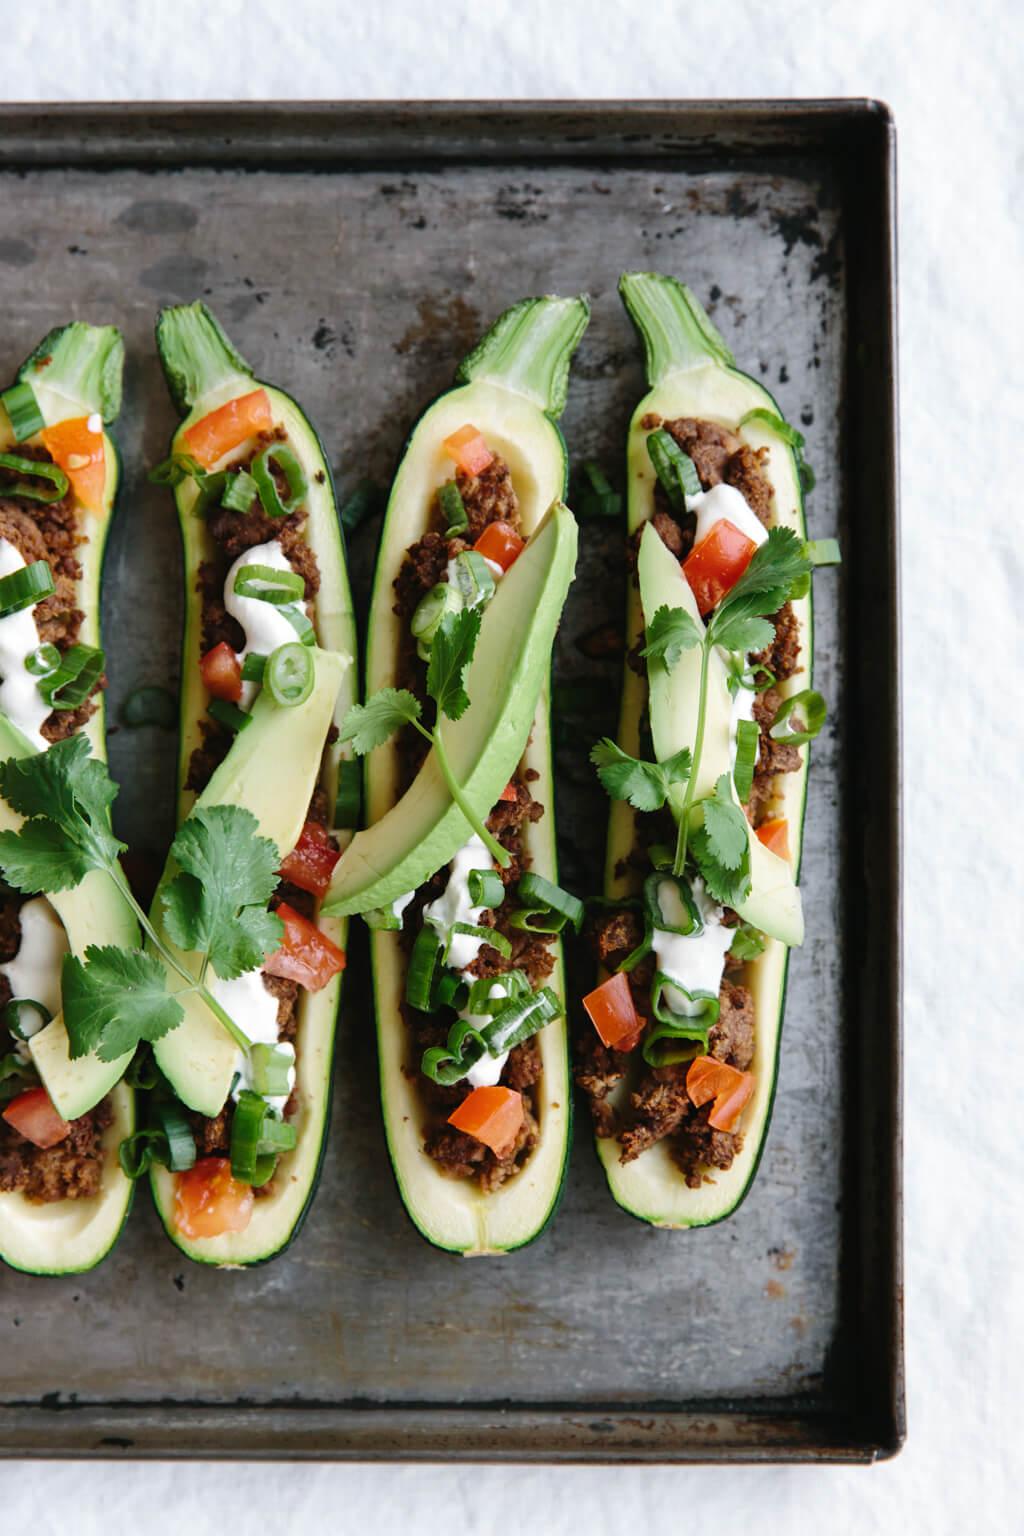 Zucchini boats on a baking sheet.